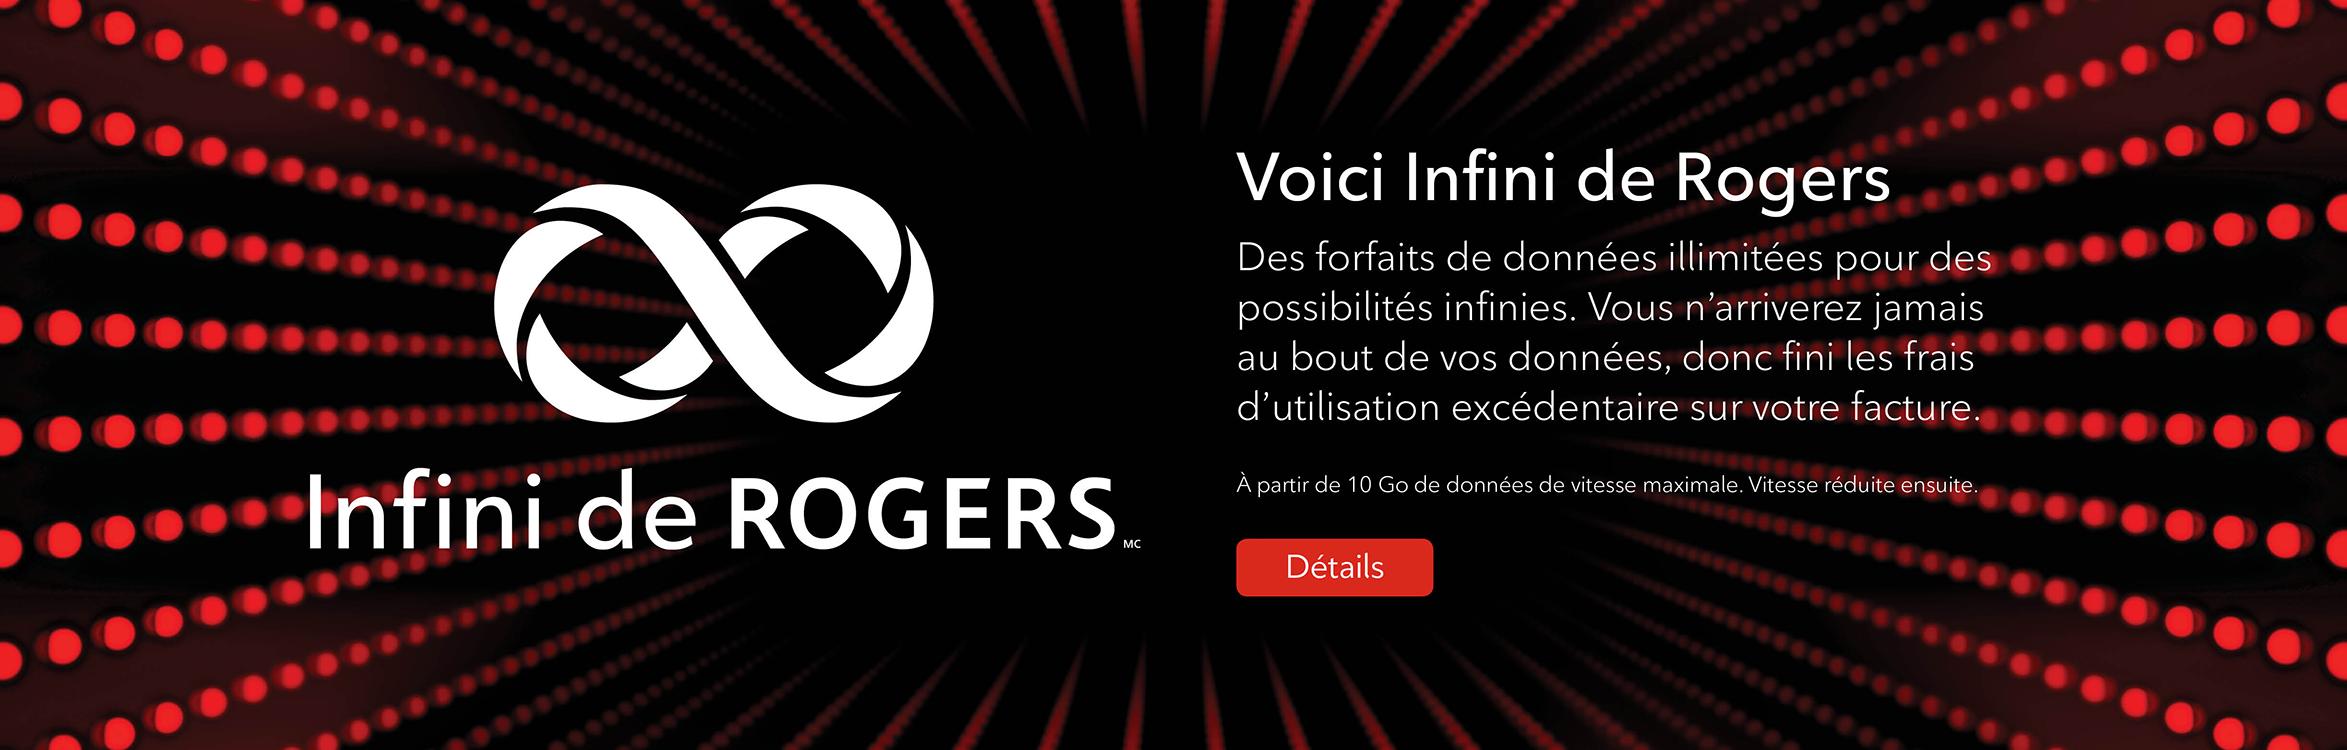 Voice Infini de Rogers